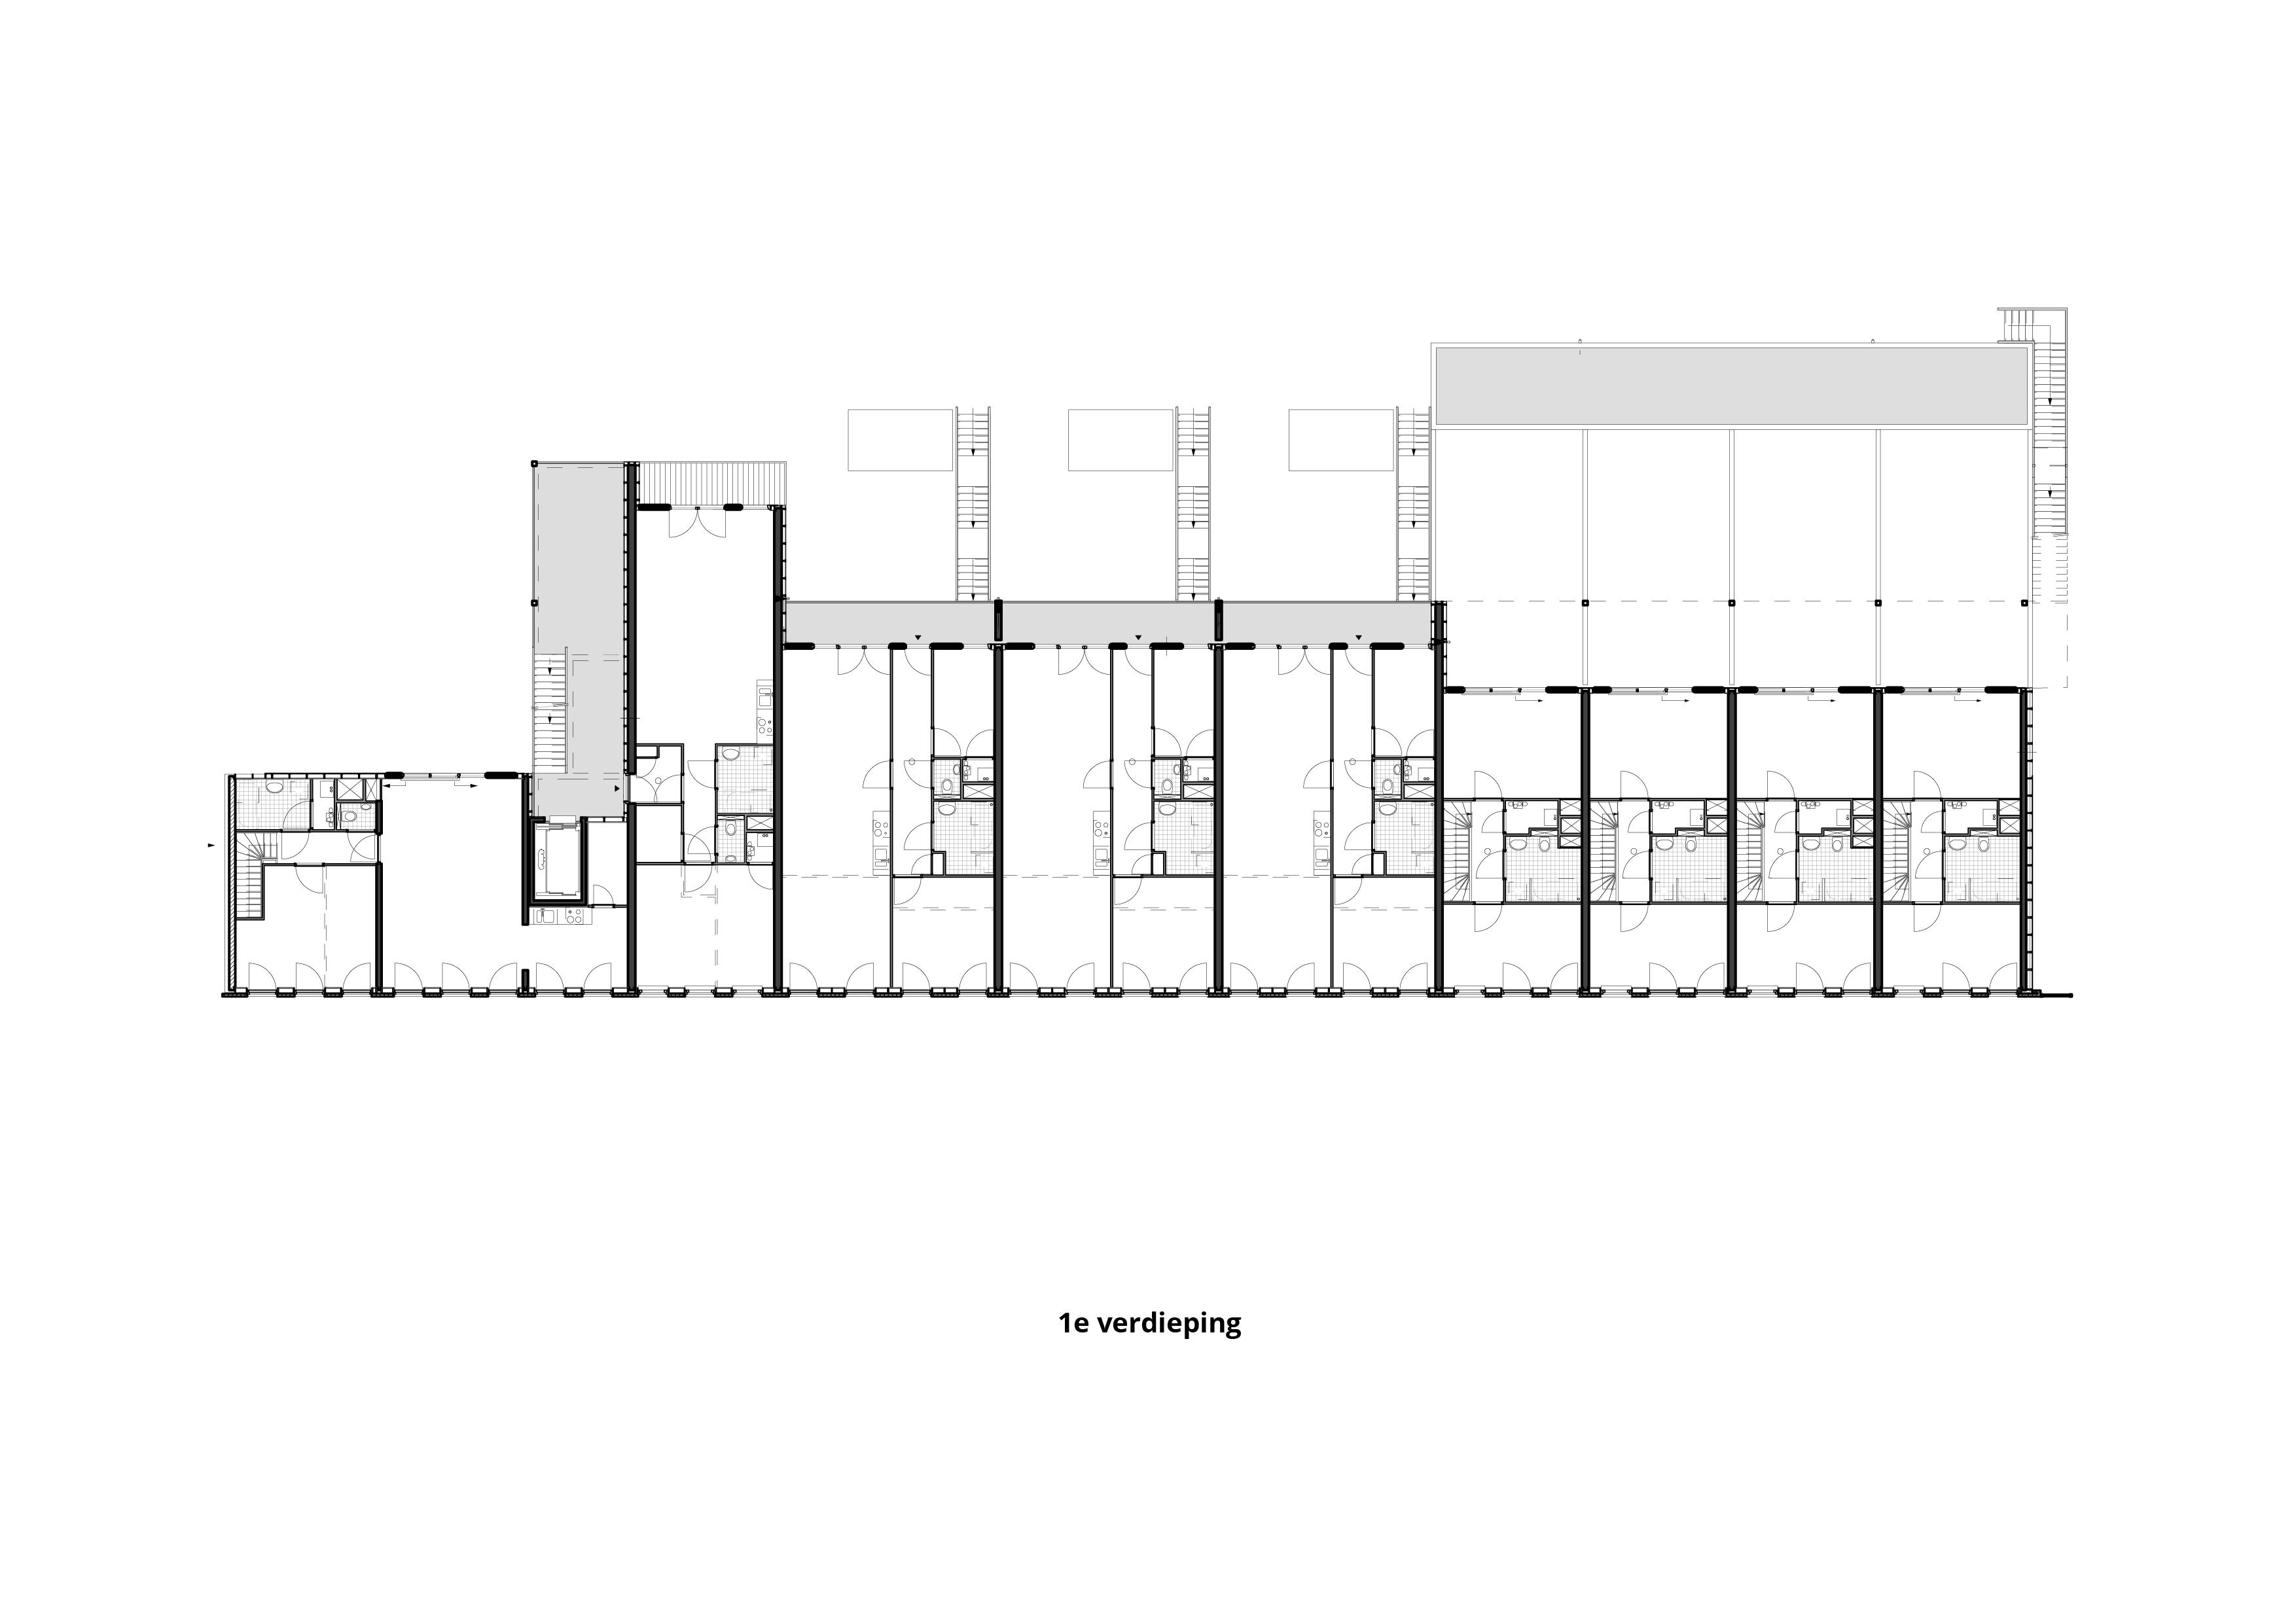 Lootsbuurt – 1e verdieping